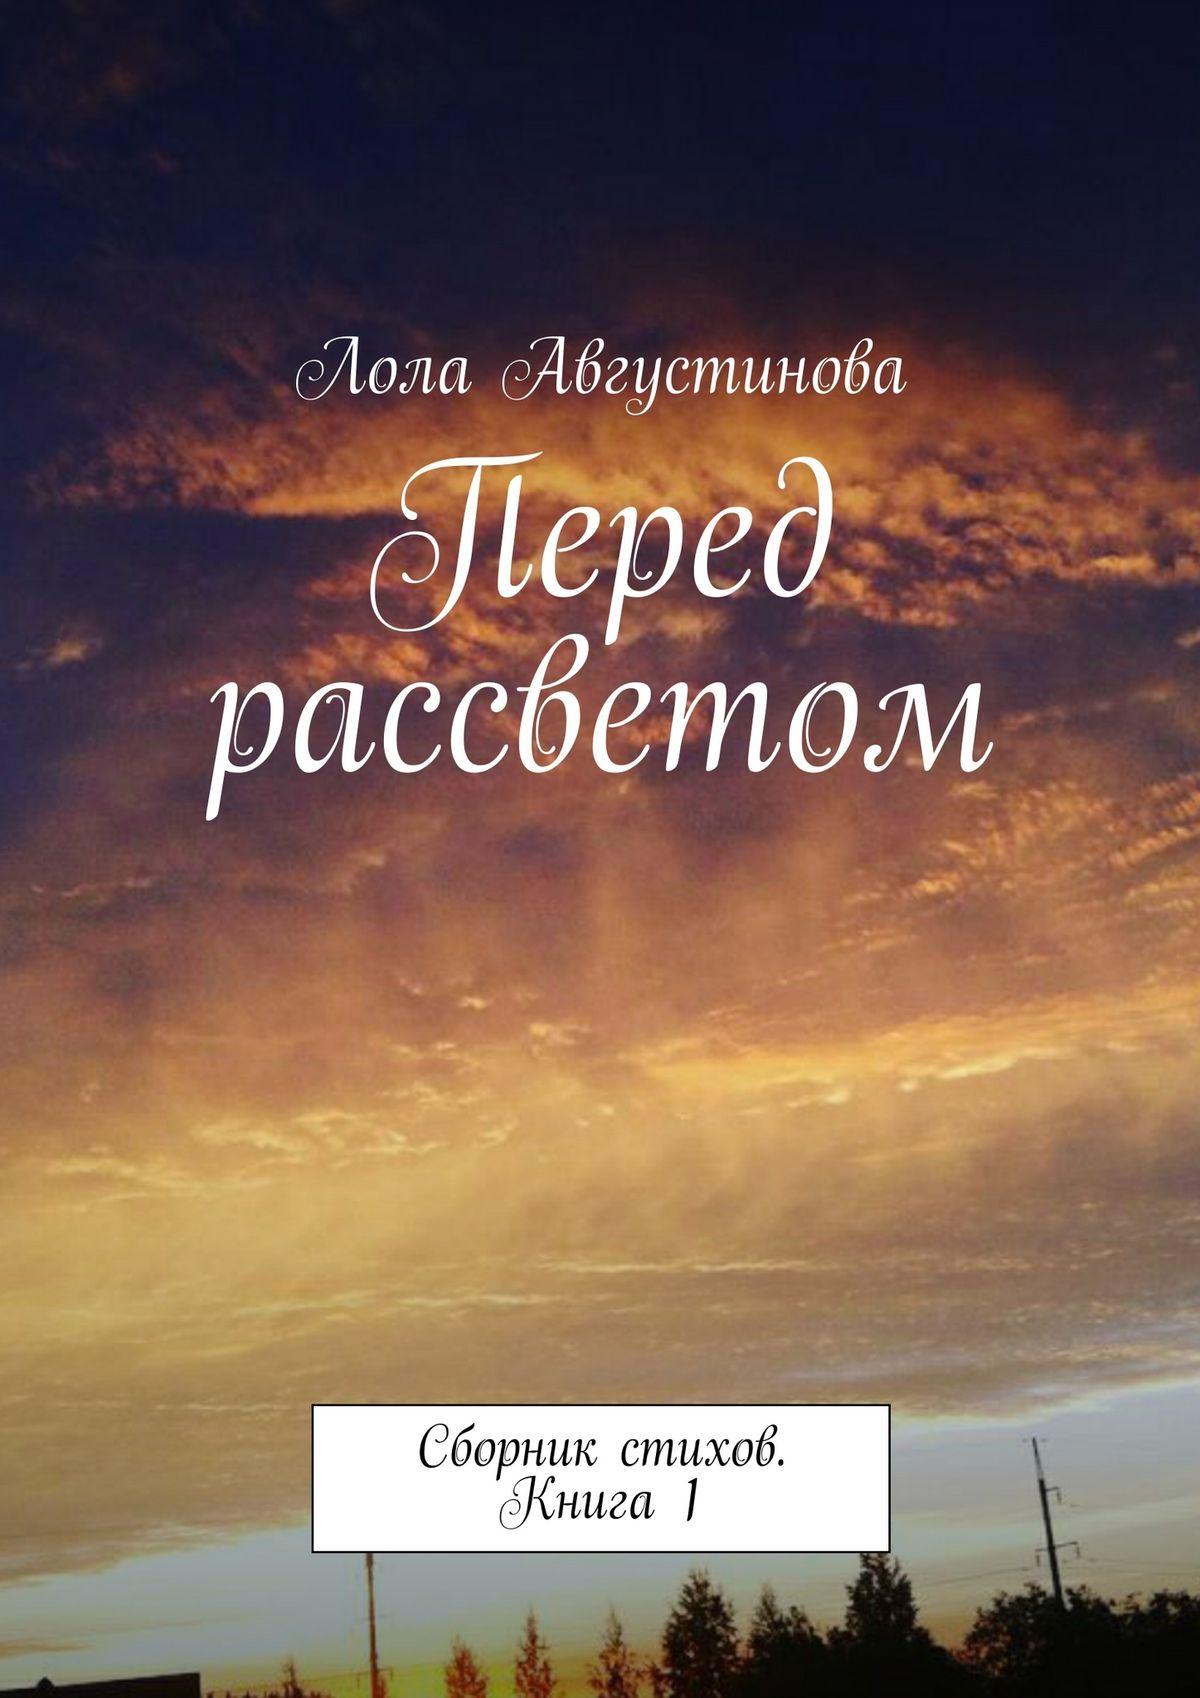 Лола Августинова Перед рассветом. Сборник стихов. Книга1 цена и фото